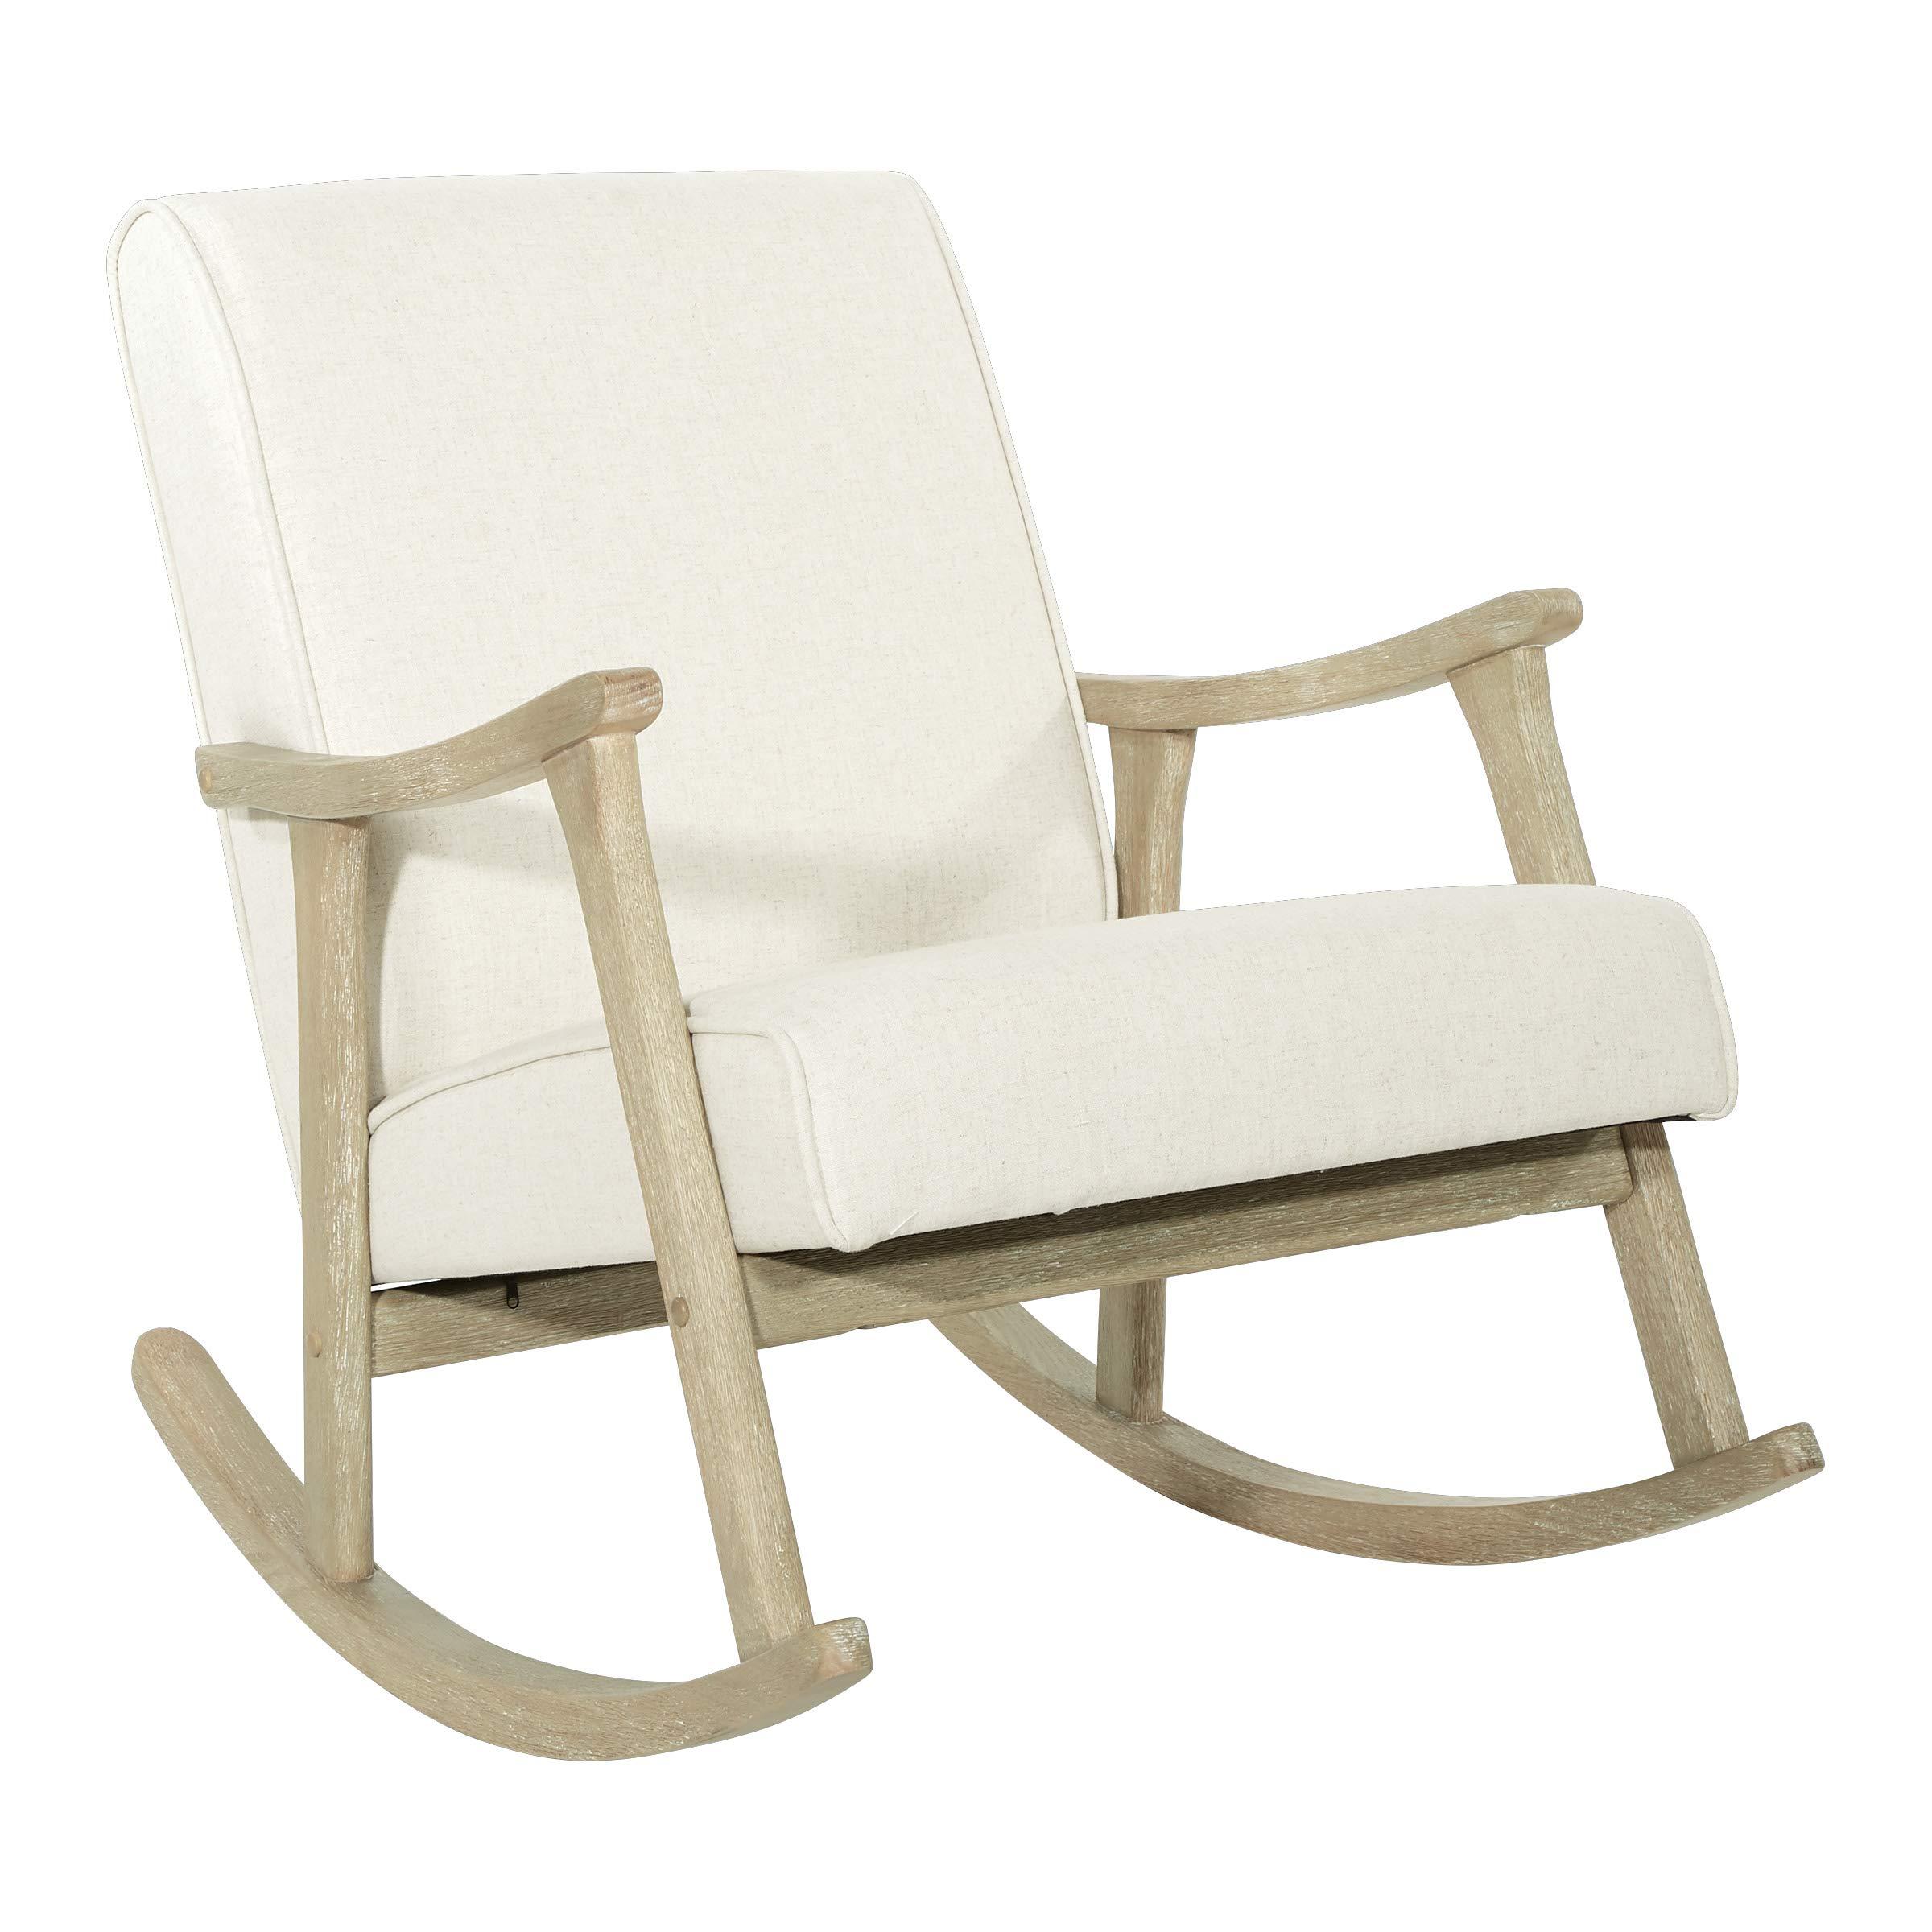 OSP Home Furnishings Gainsborough Rocking Chair, Linen by OSP Home Furnishings